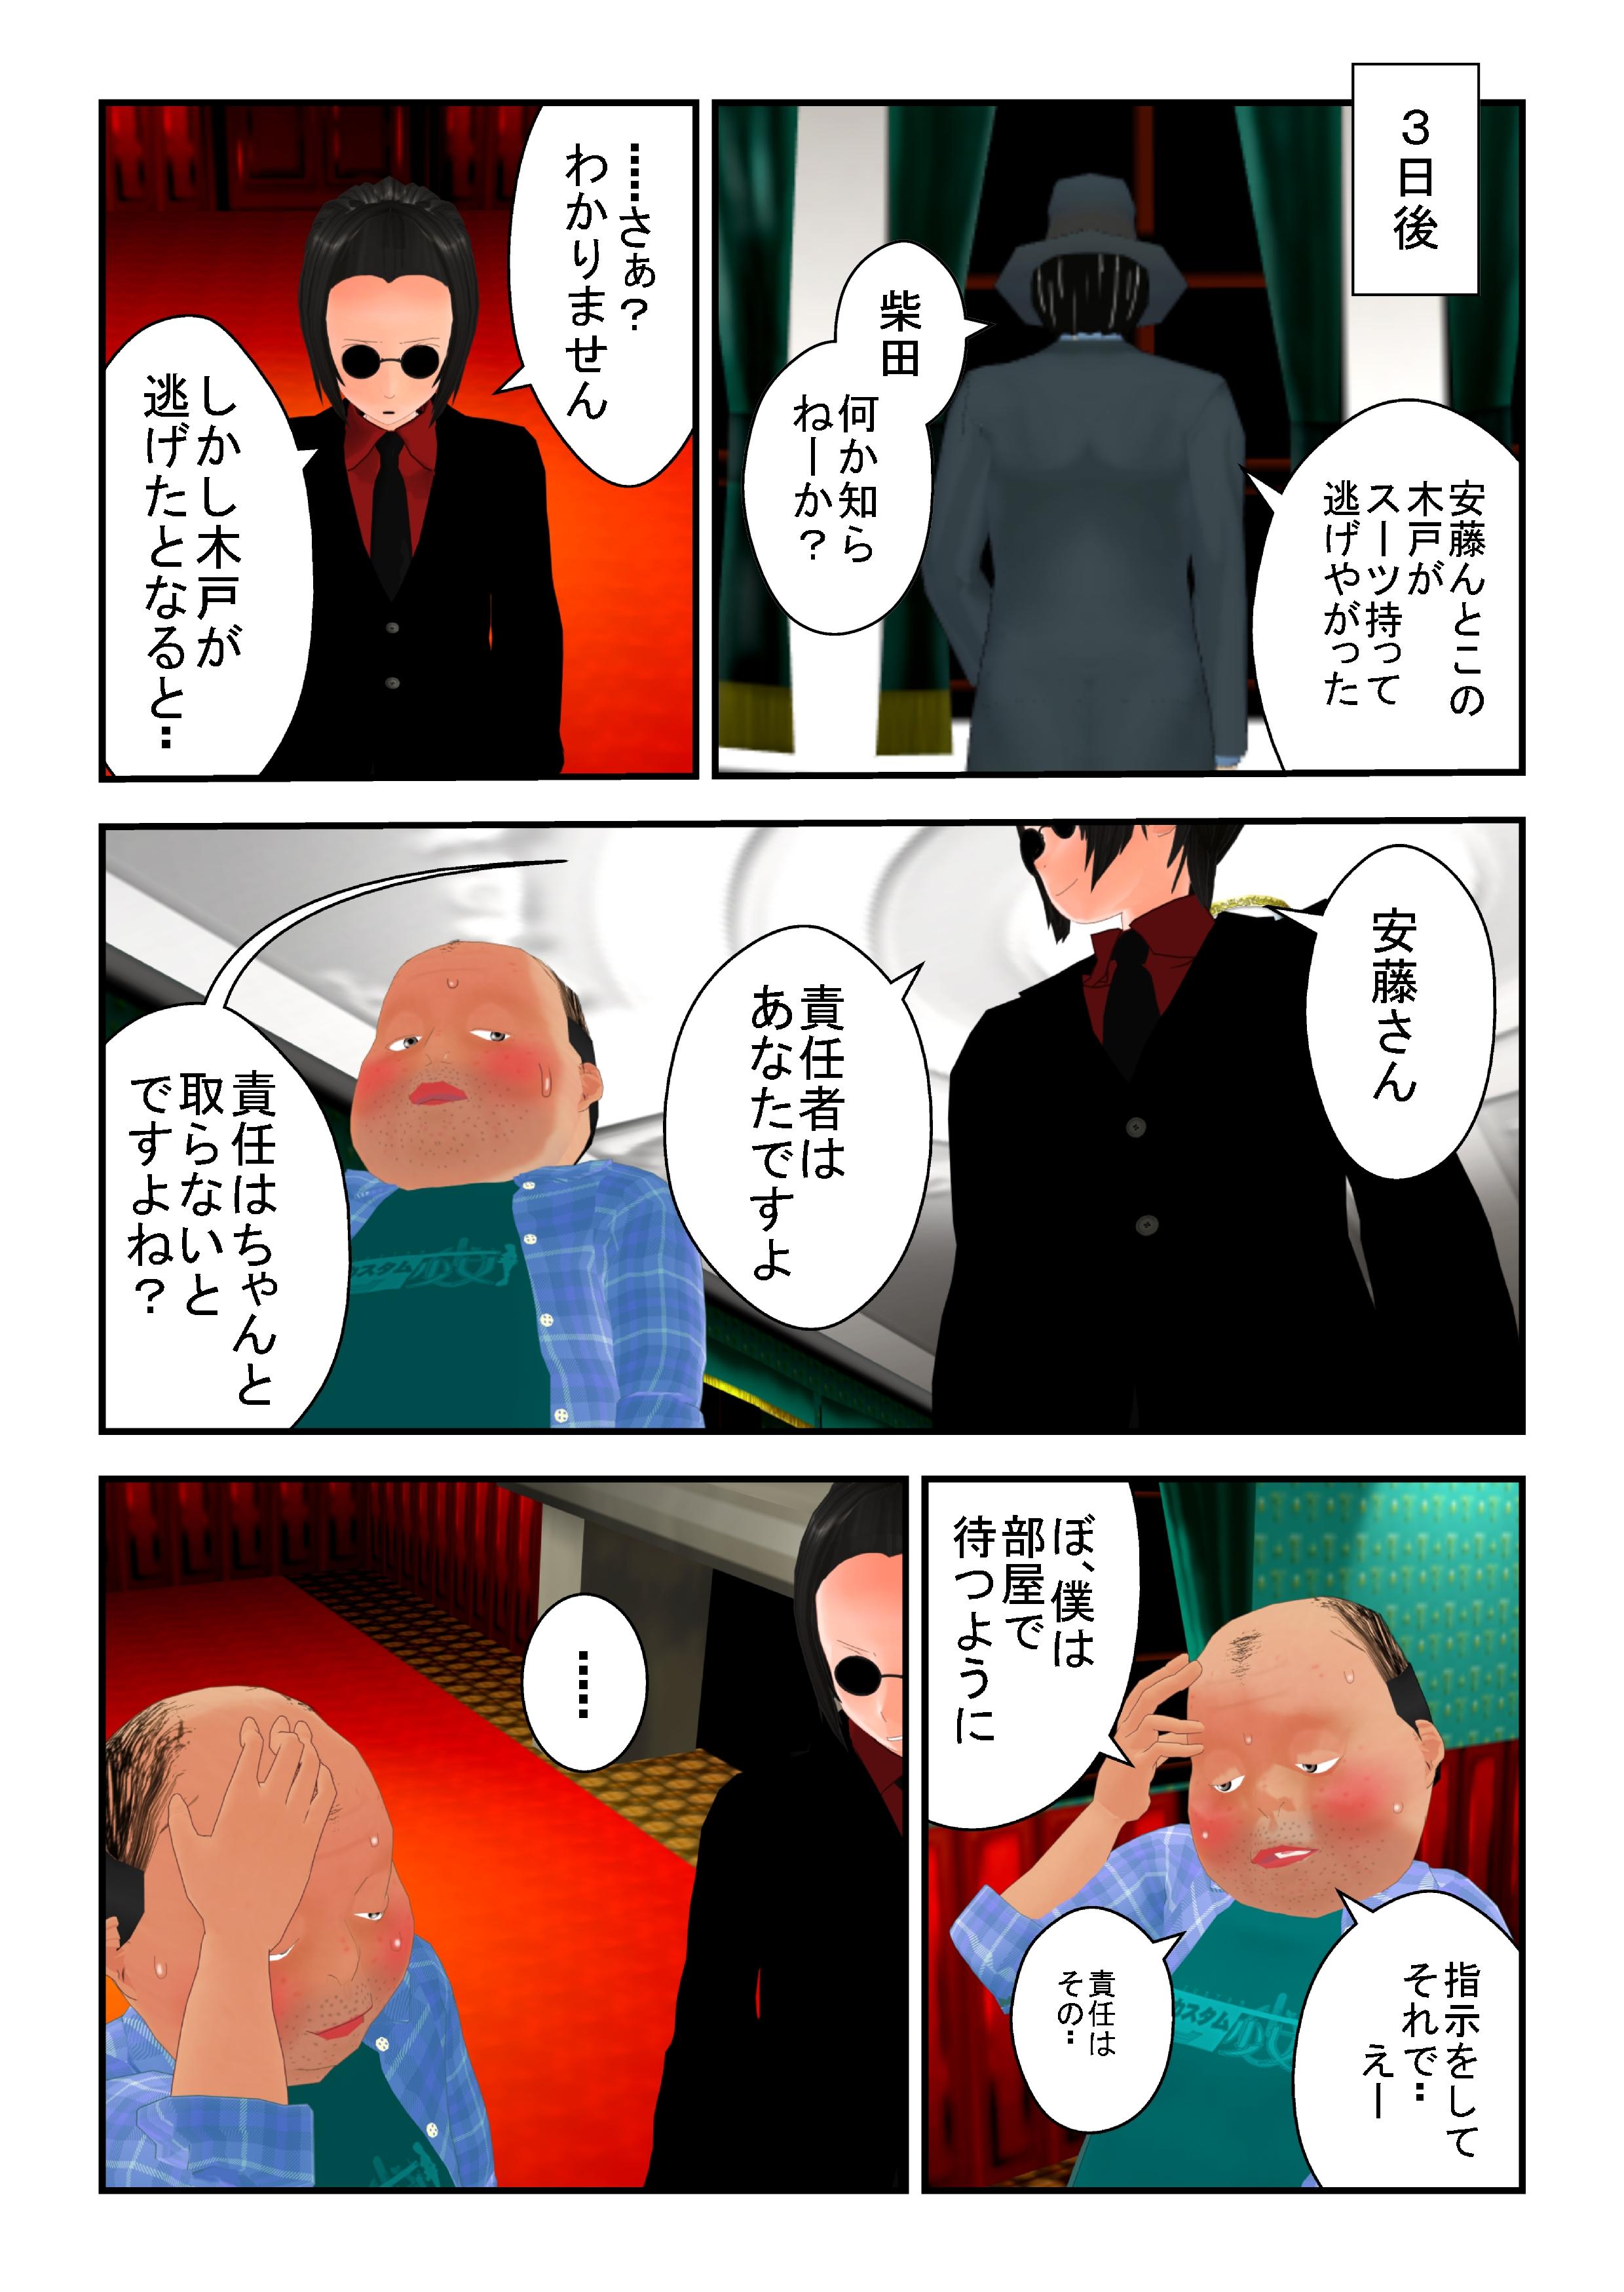 shi_0045.jpg